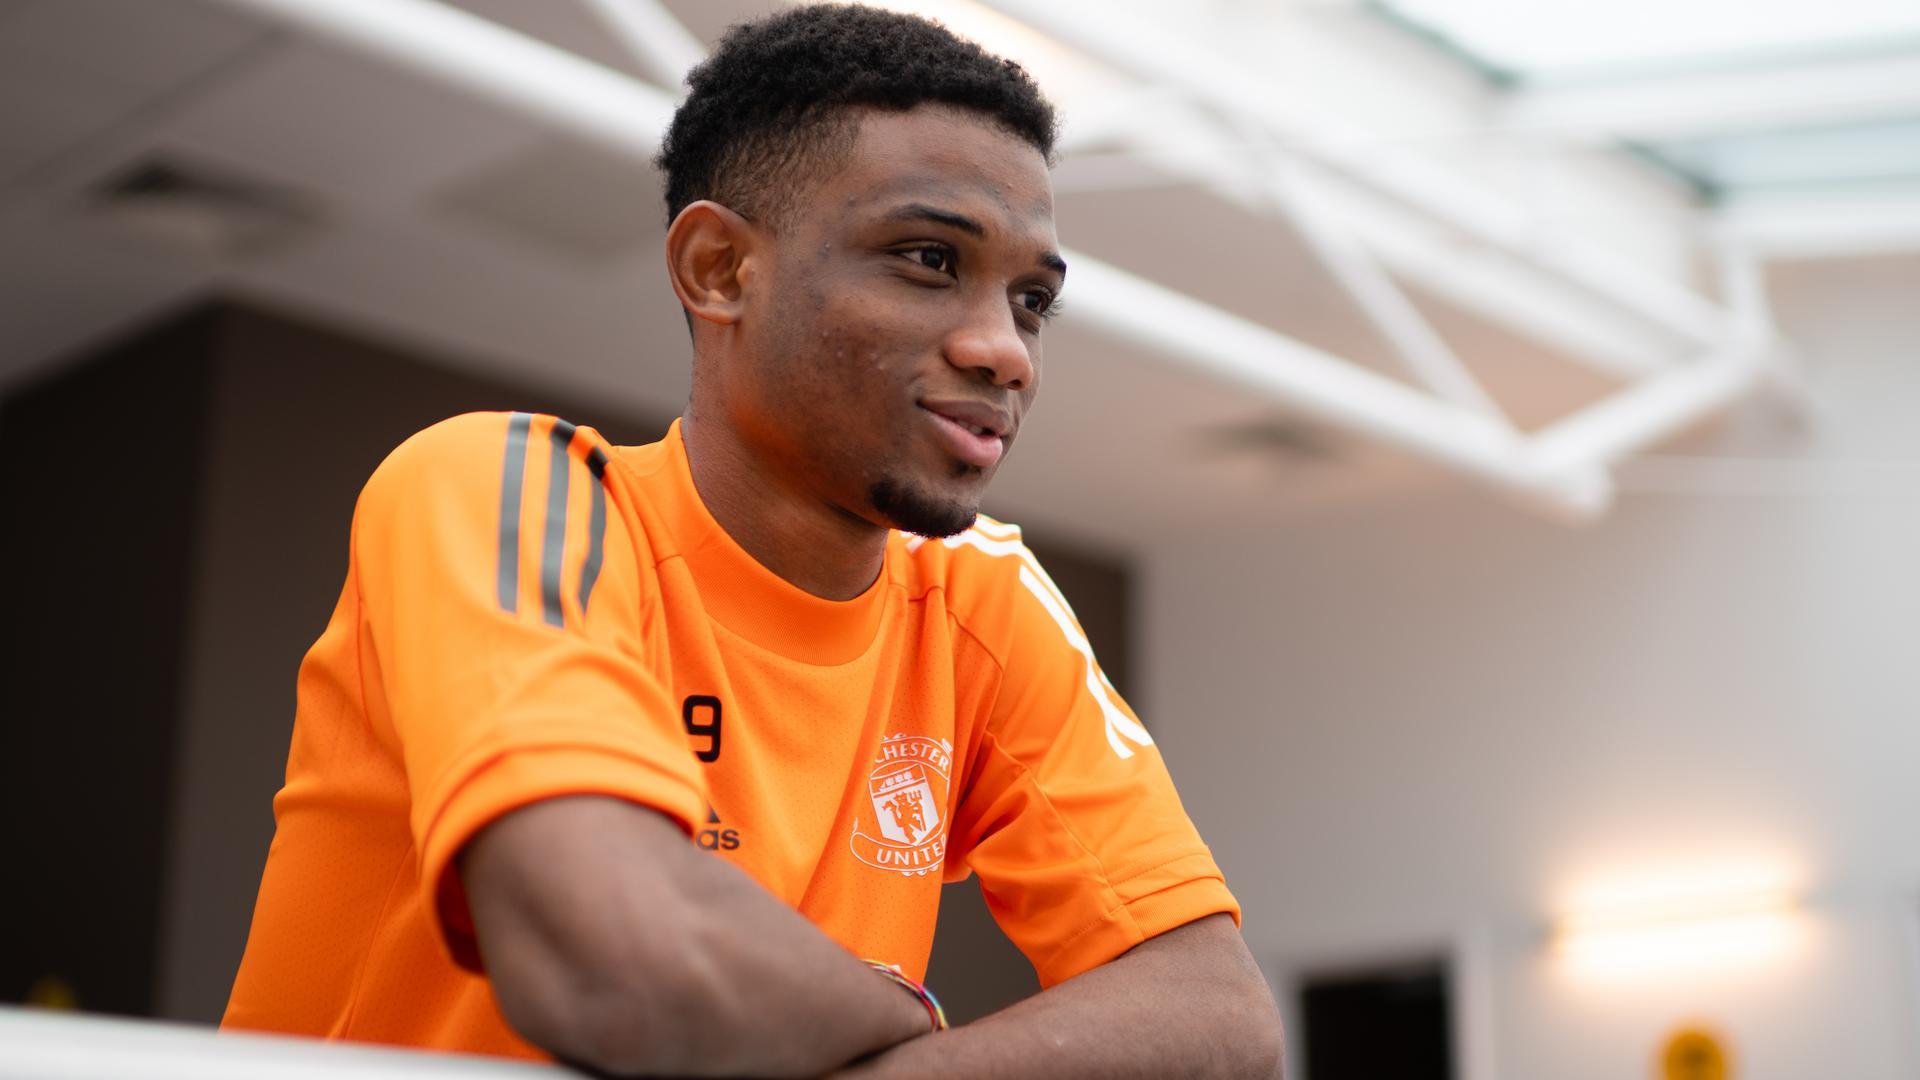 Primer día de Amad Diallo en Carrington   Web oficial del Manchester United